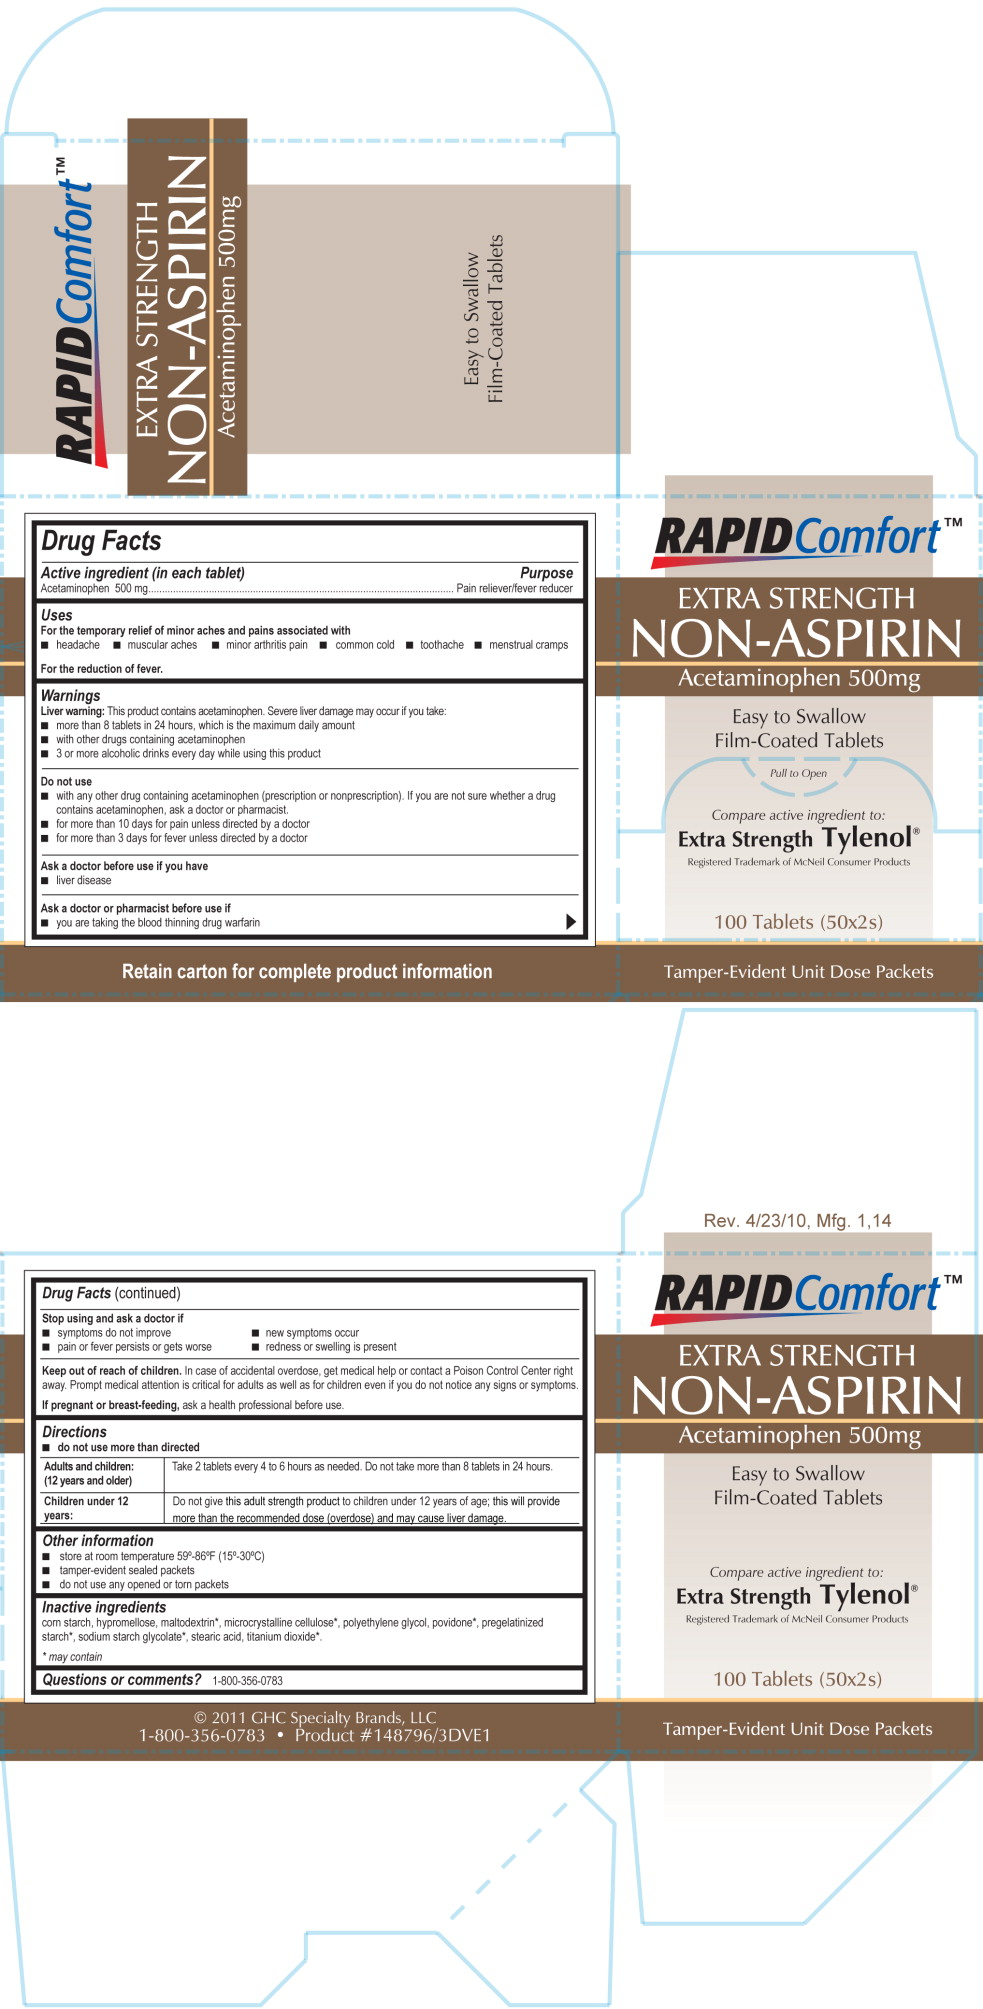 175R LSS XS Non Aspirin 500 mg Label